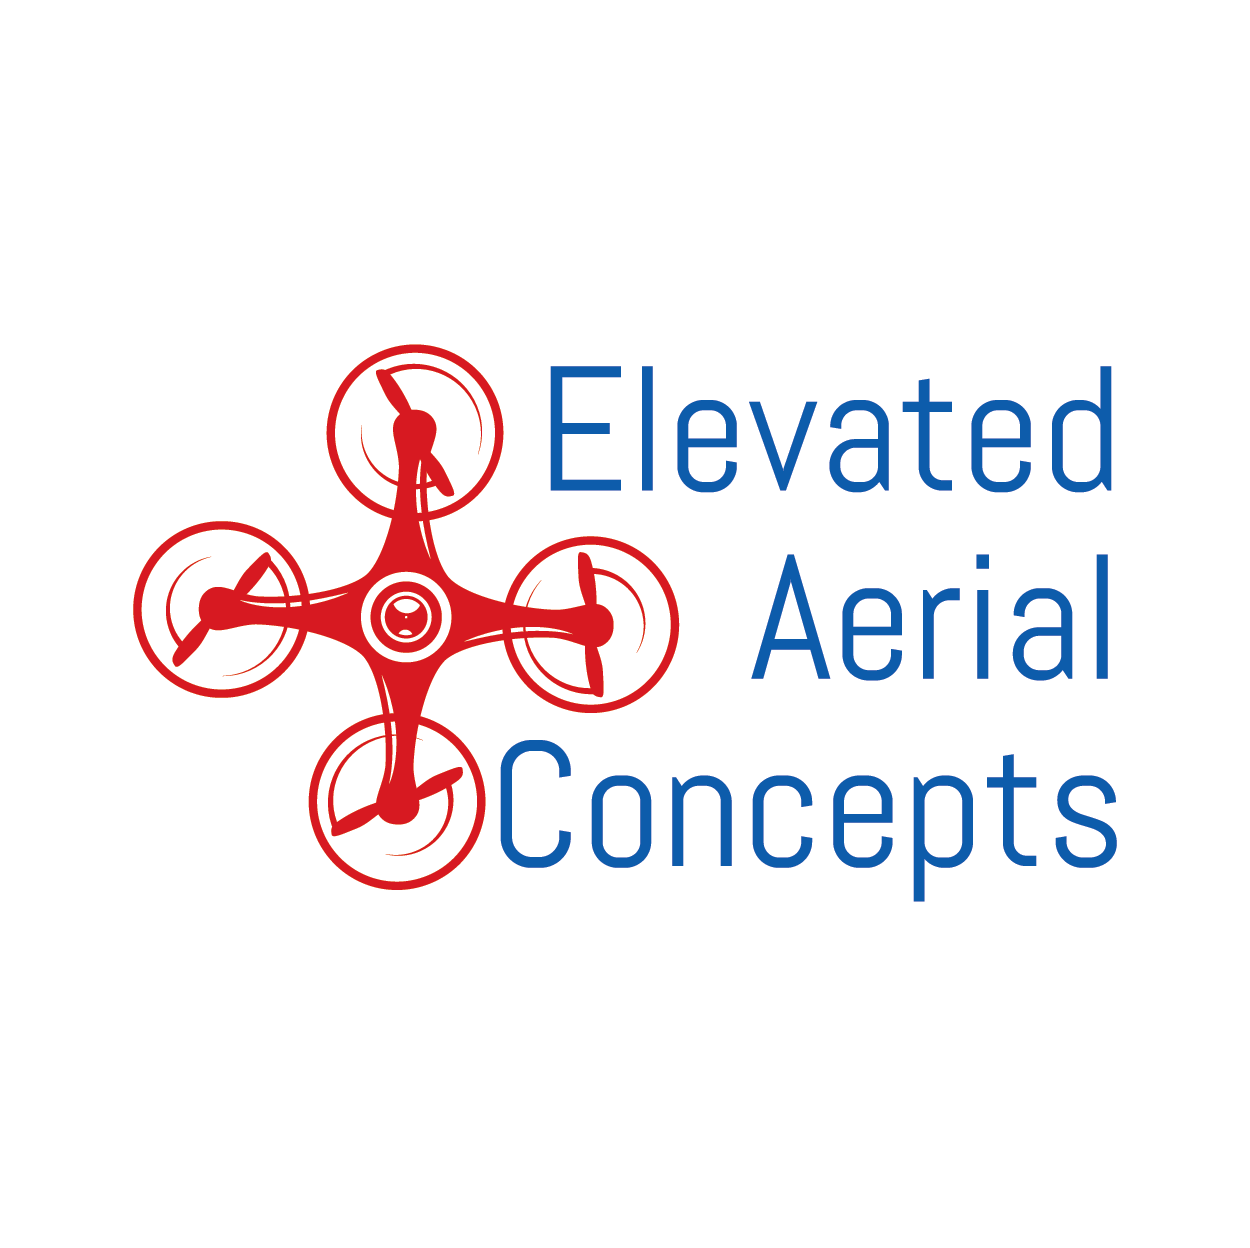 Elevated Aerial Concepts floor plan in Felton